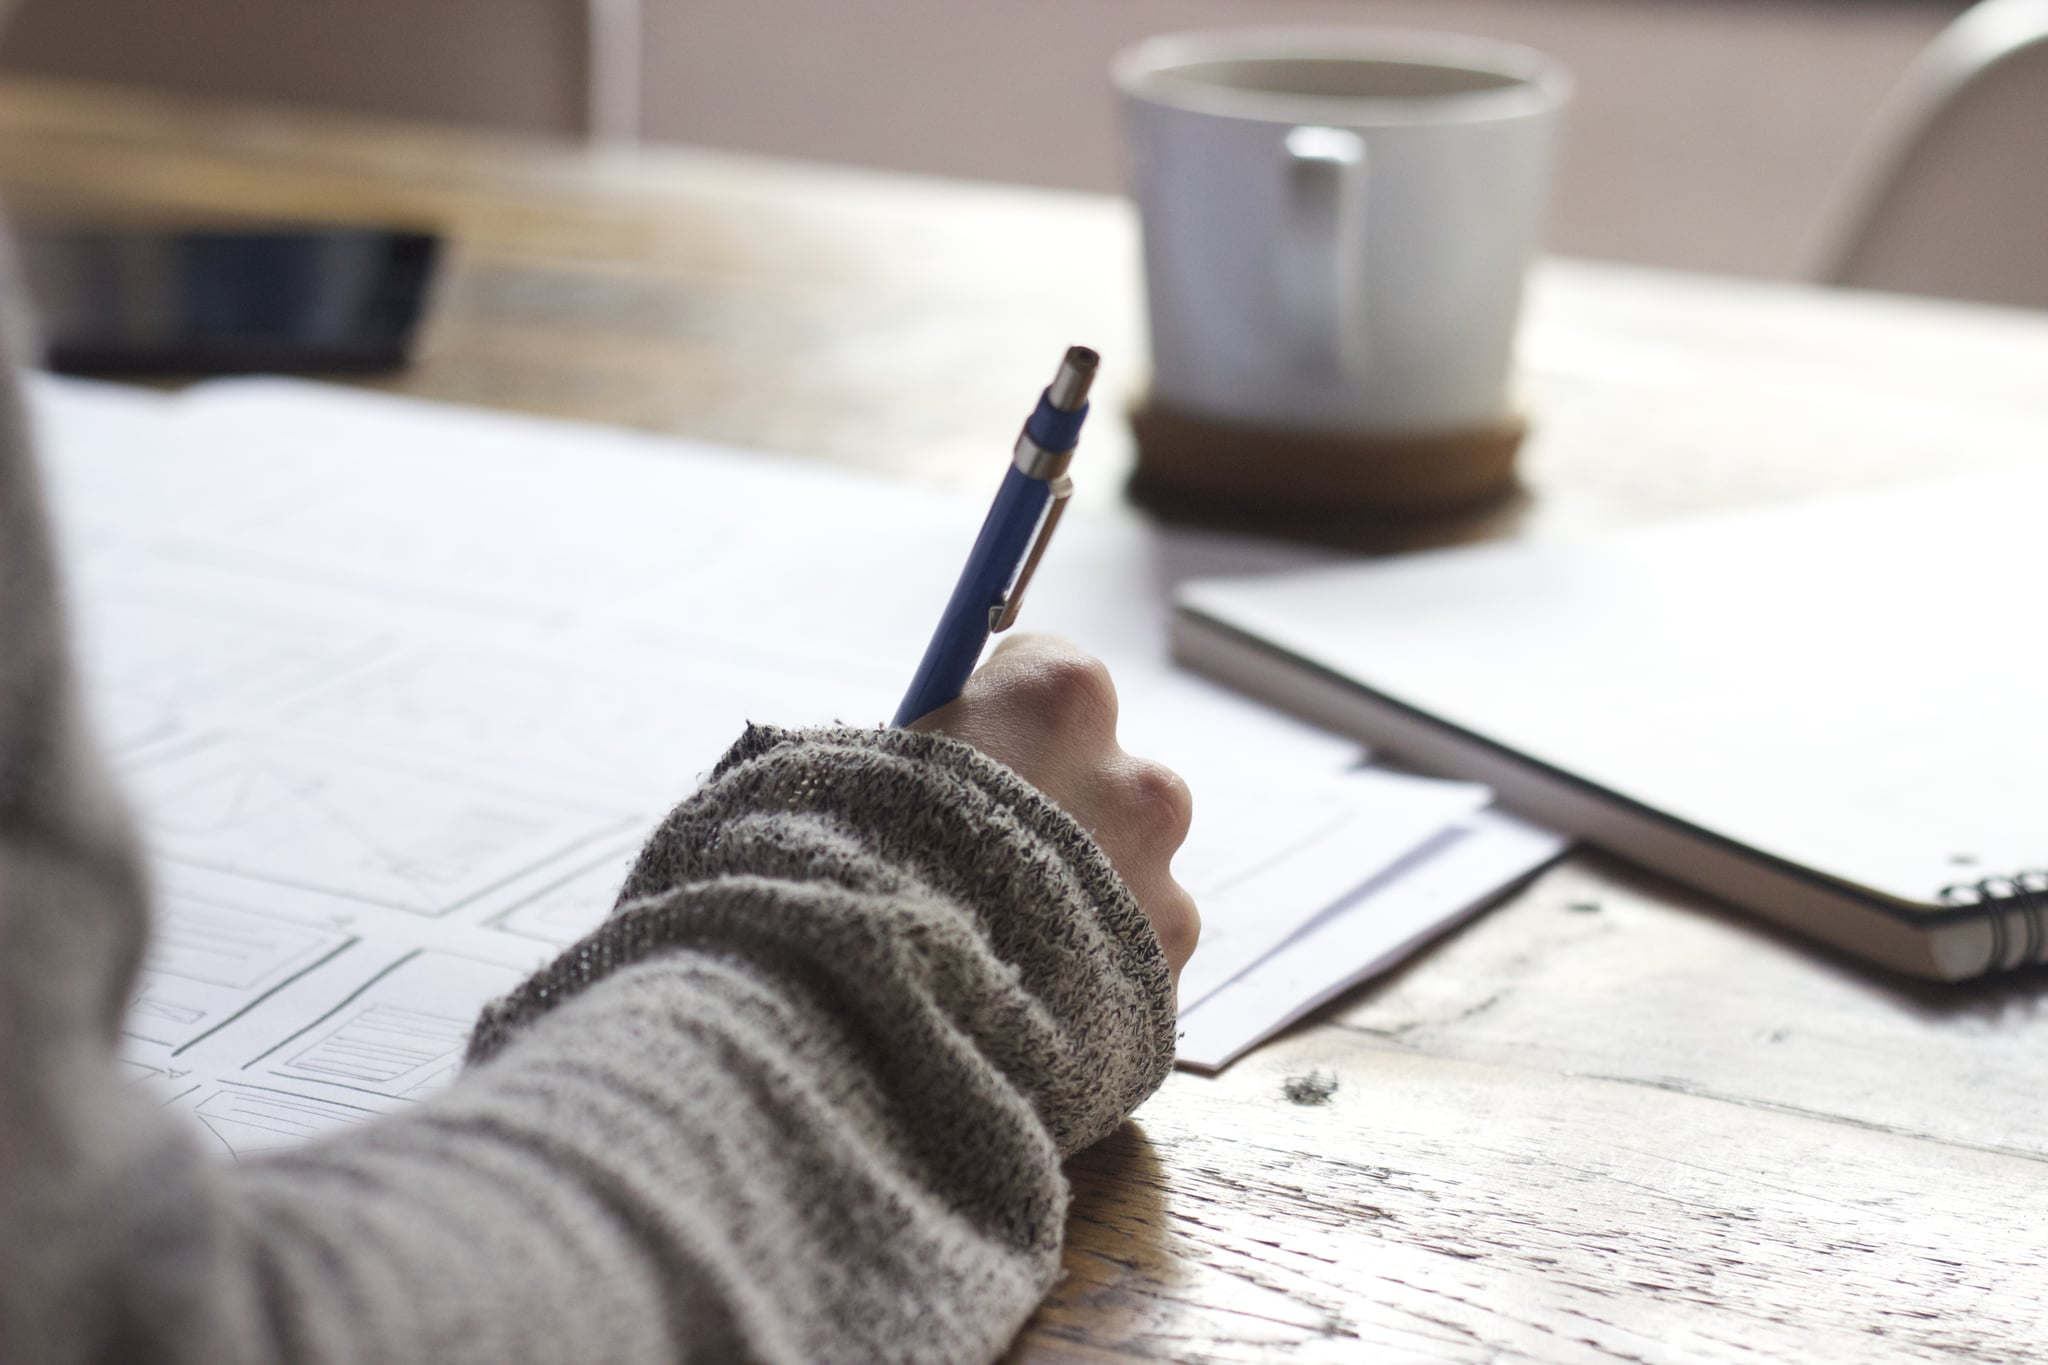 How to List Temp Jobs on ResumePOPSUGAR Career and Finance